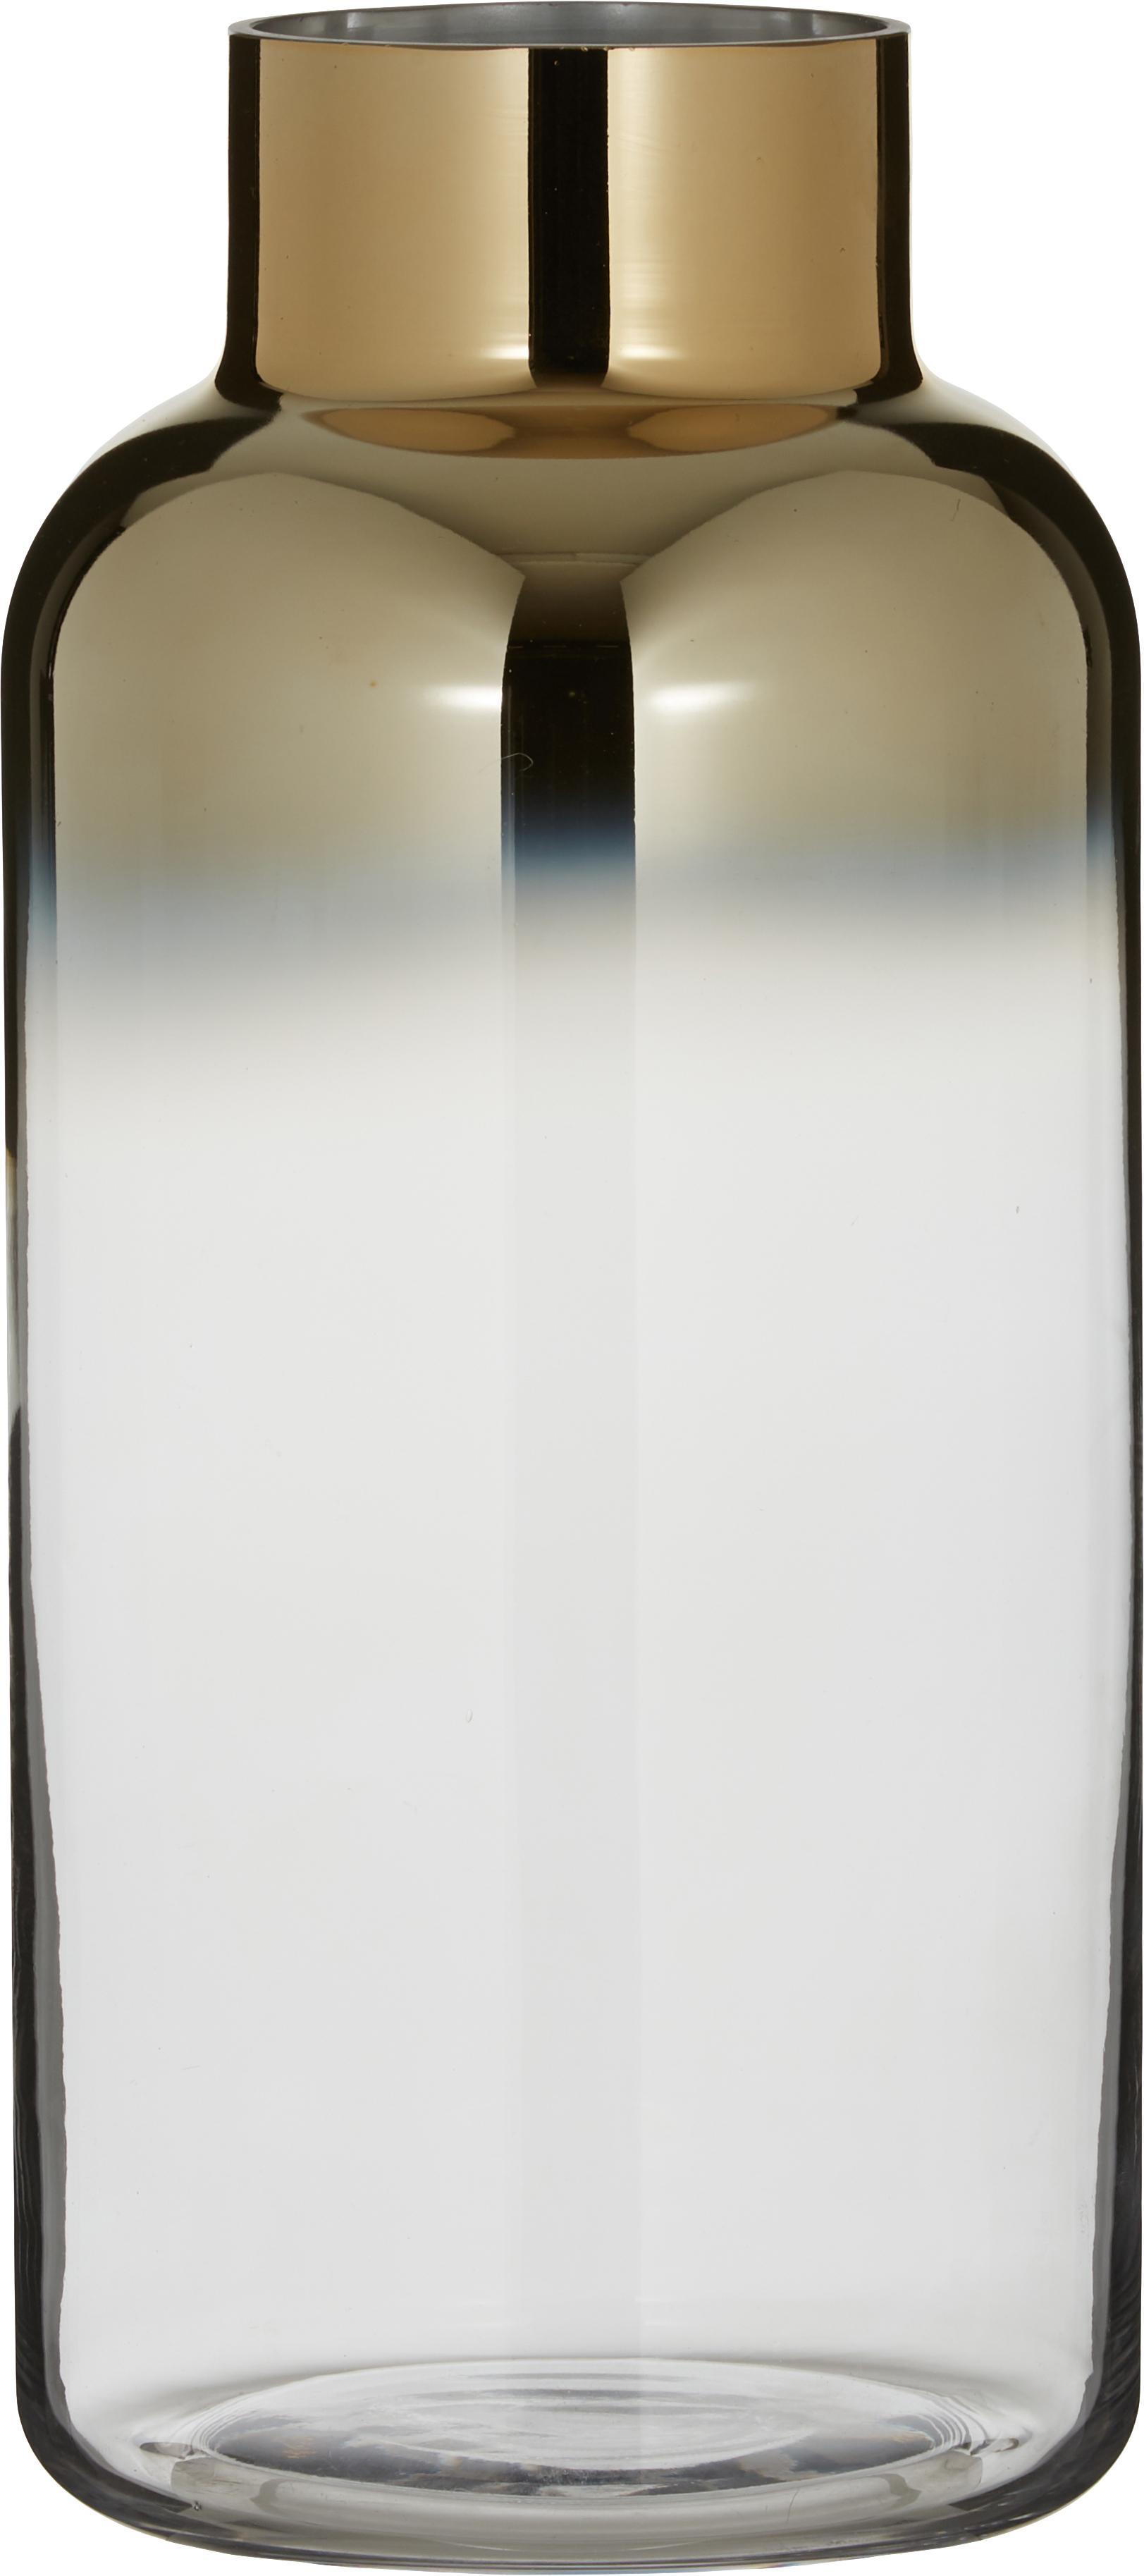 Jarrón Uma, Vidrio, Vidrio, dorado, Ø 16 x Al 35 cm